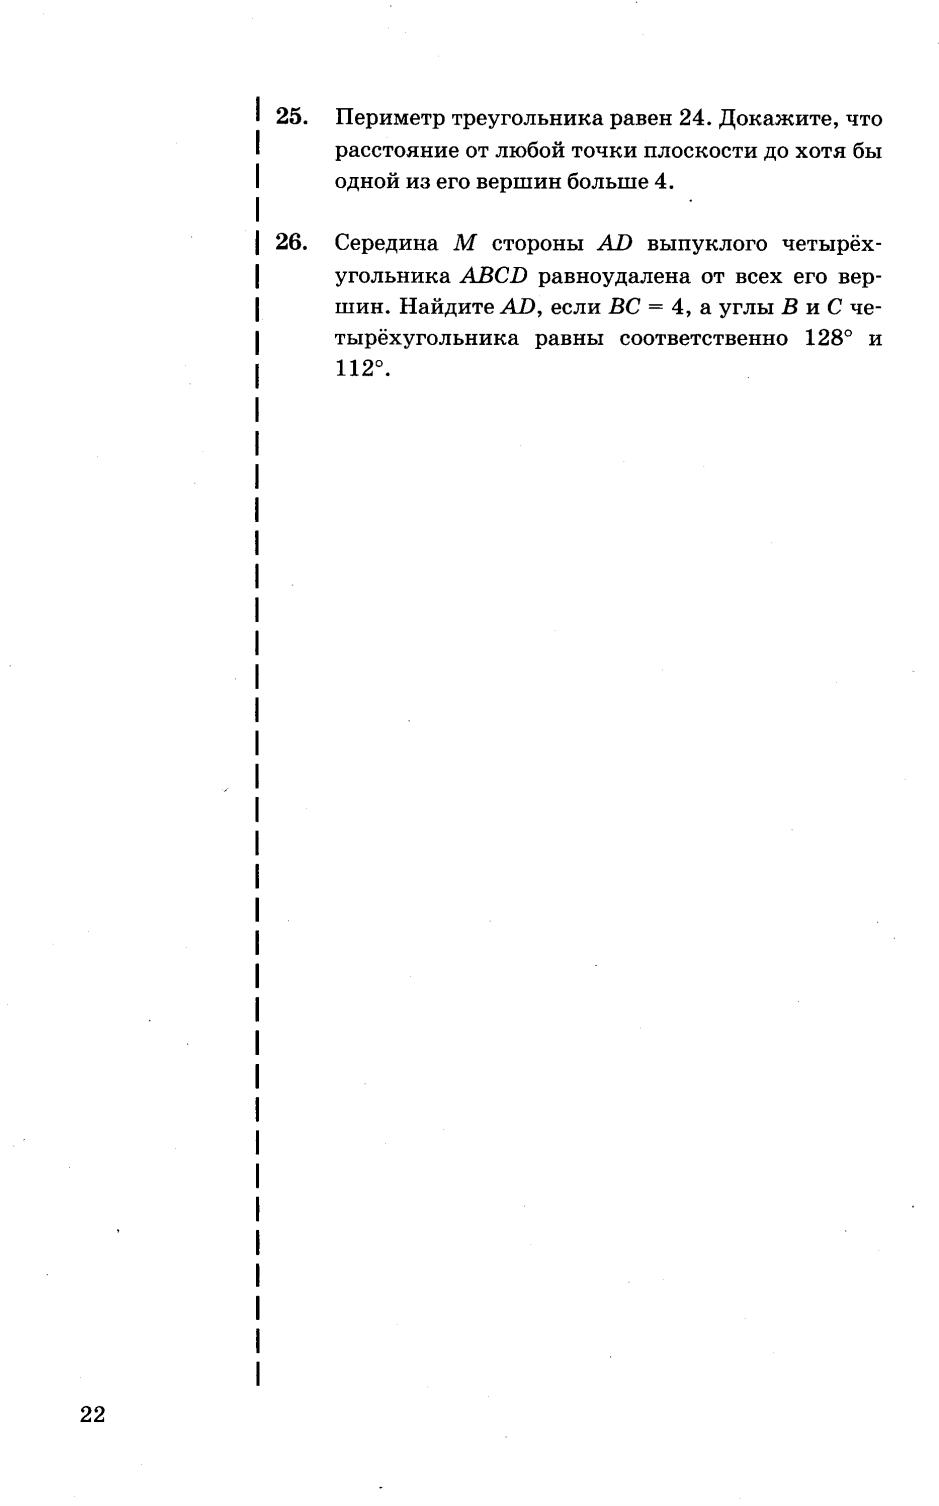 https://docs.google.com/viewer?pid=explorer&srcid=0Bw_f54pvrxEtbldKNGgyaFE3TDg&chrome=false&docid=e803bf4555b2fe7a8e01072ad16bc93b%7Cc9acad21277b9c8c76d1236b5bcea6e2&a=bi&pagenumber=23&w=939